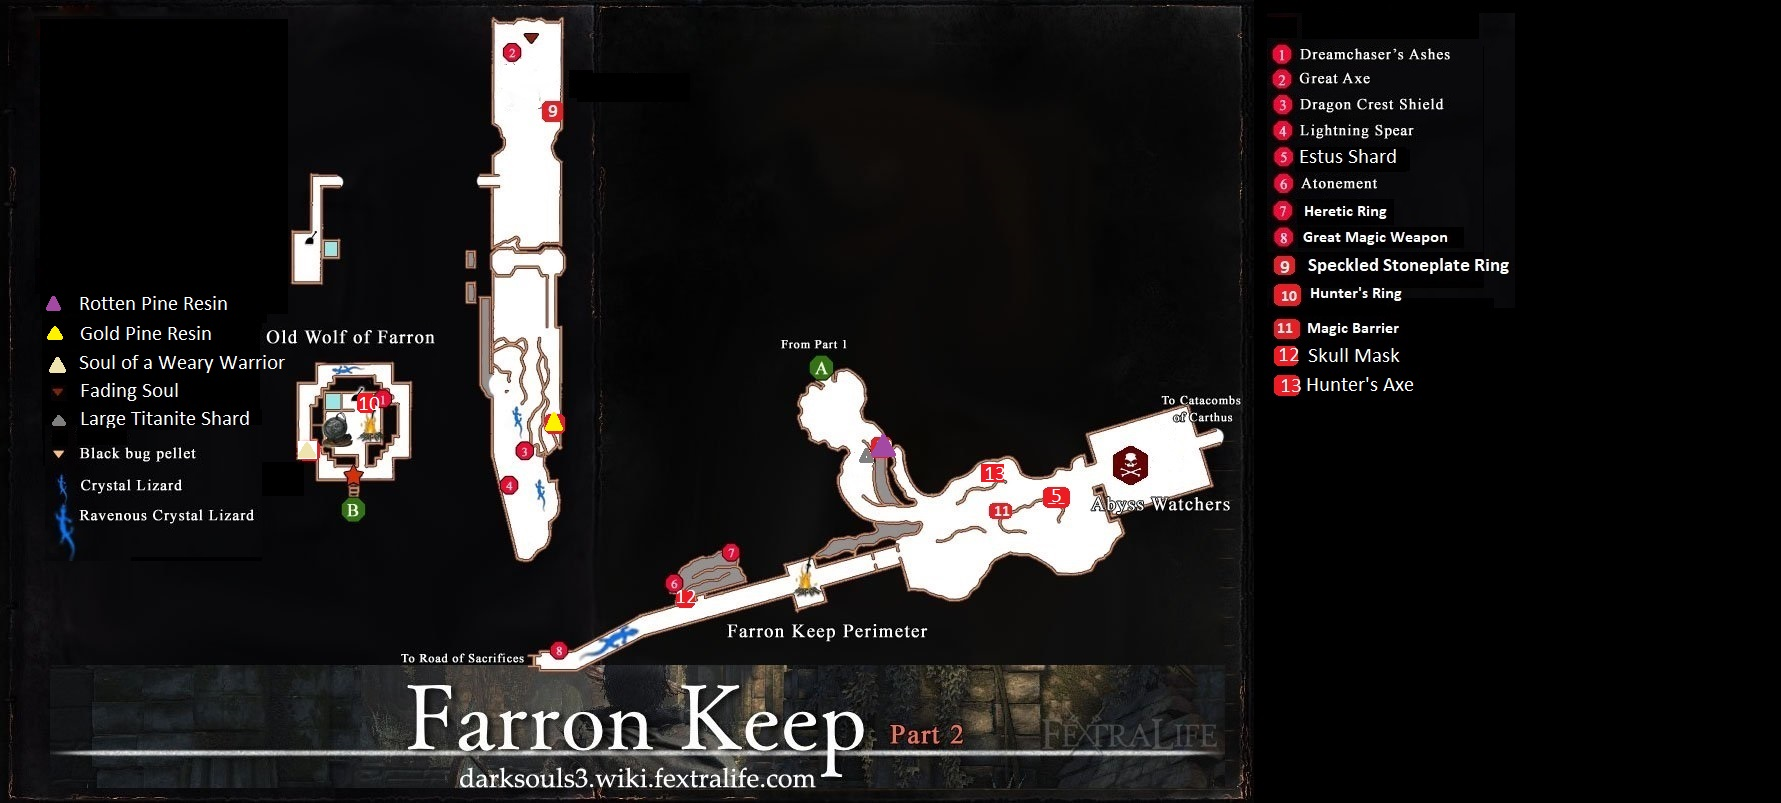 farron-keep-map2.jpg